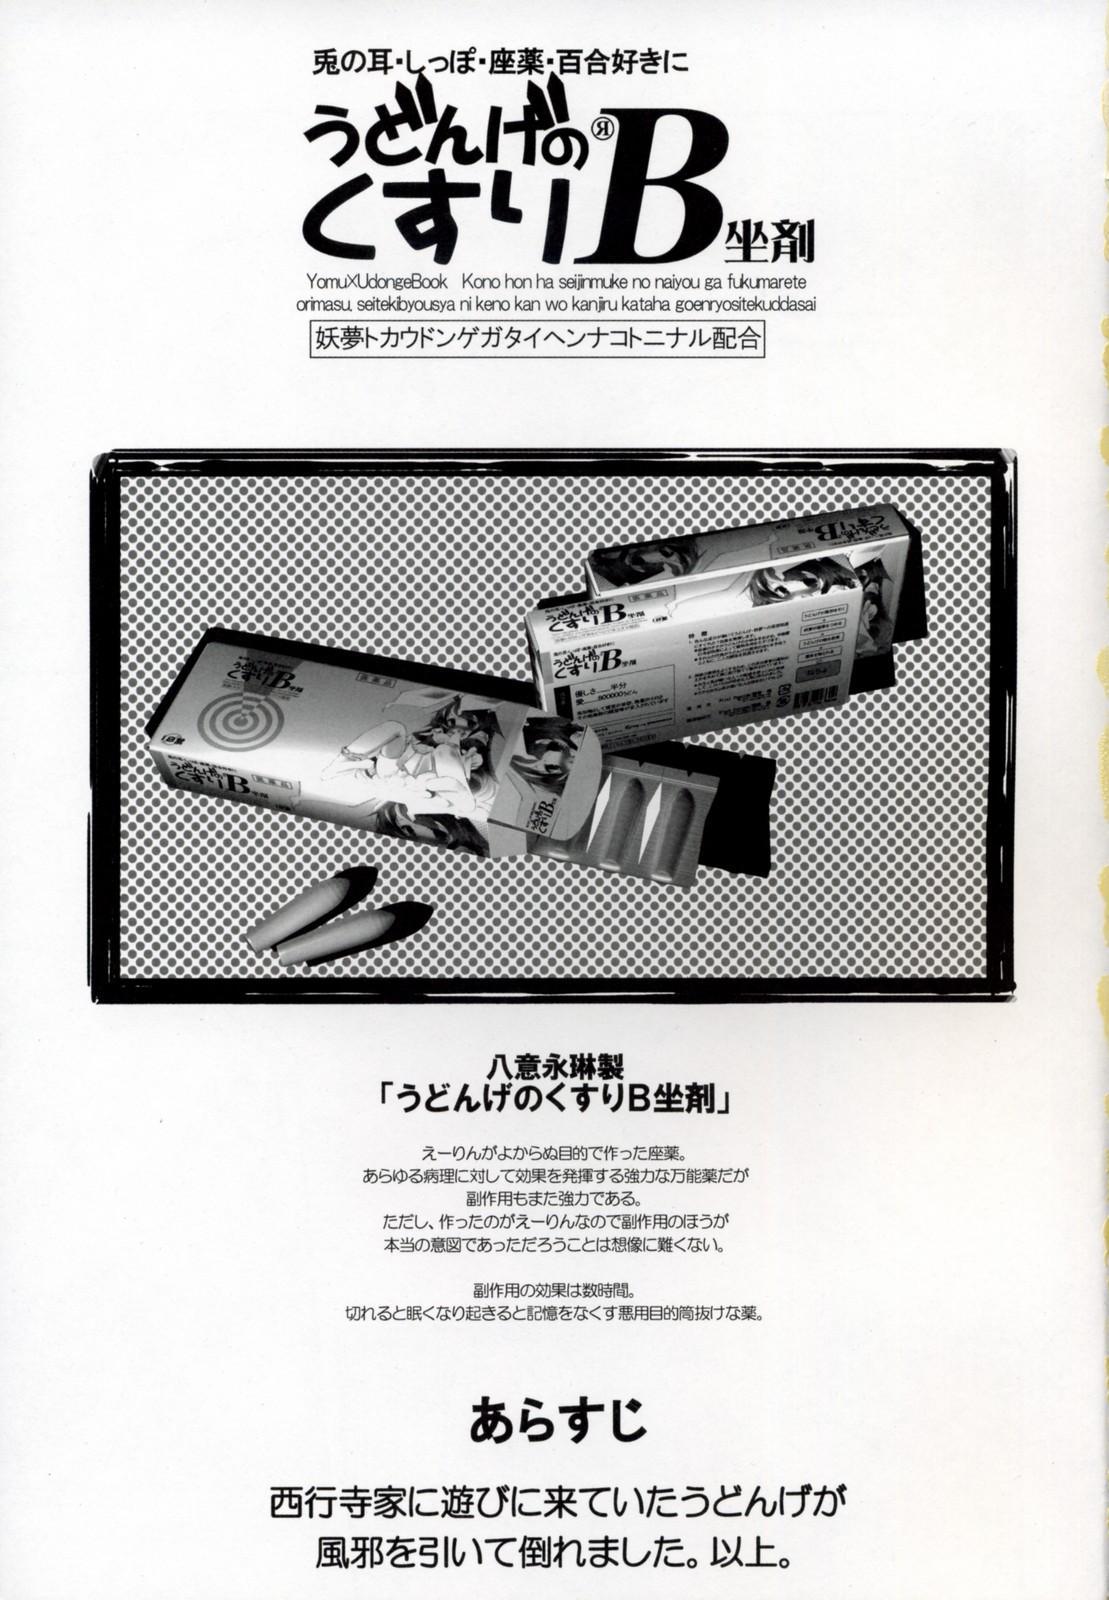 Udonge no Kusuri B Zazai 2